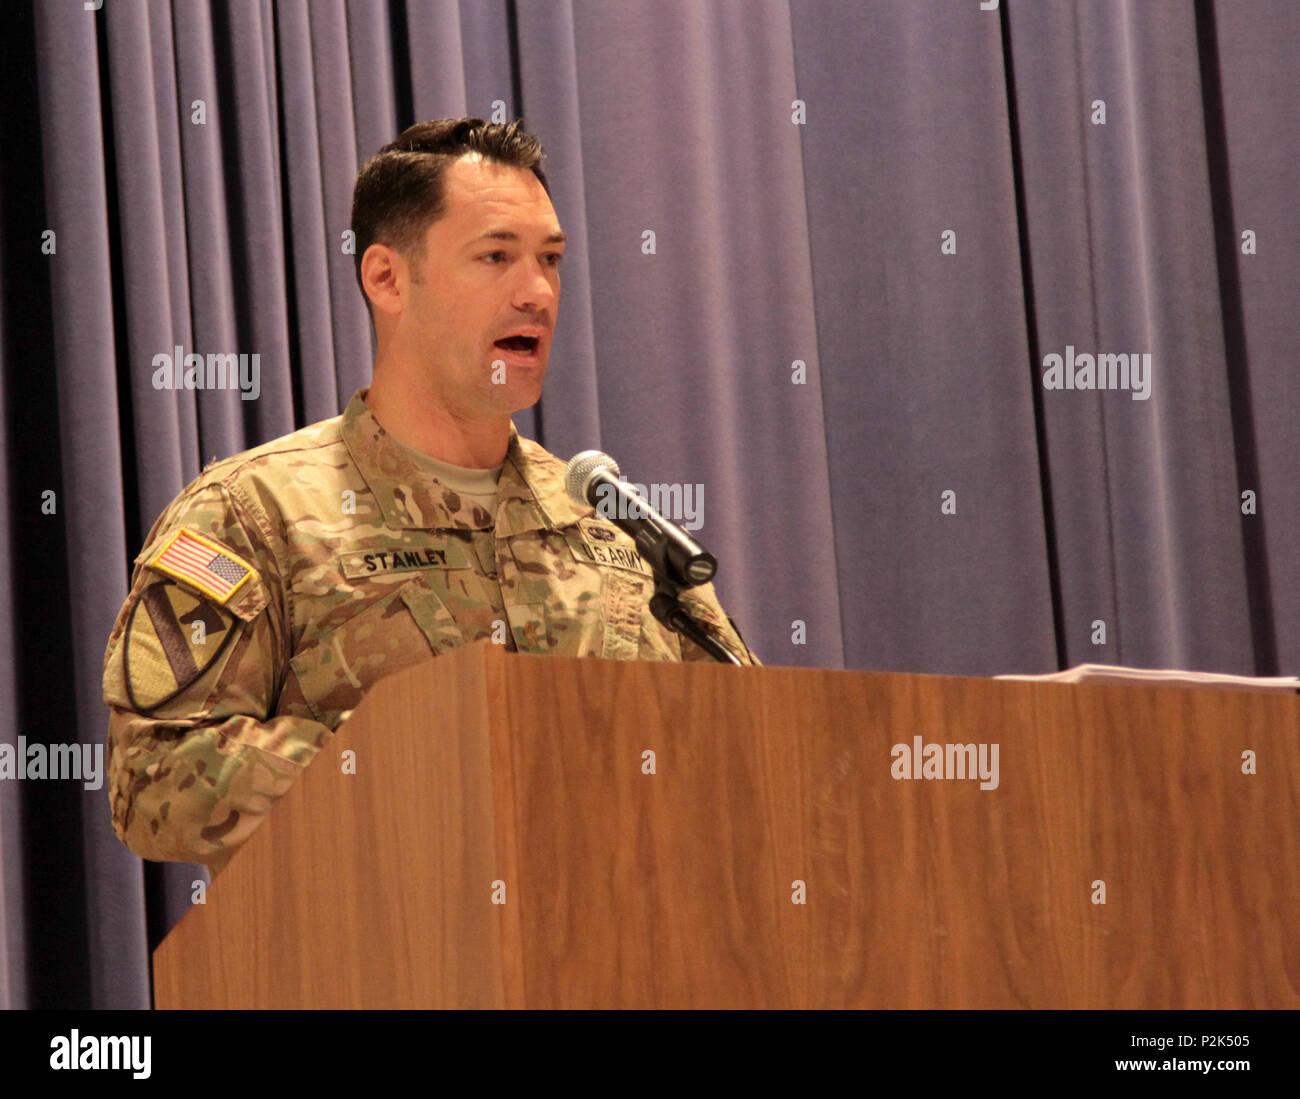 United States Army Reserve Strategic Command Troop Program Unit